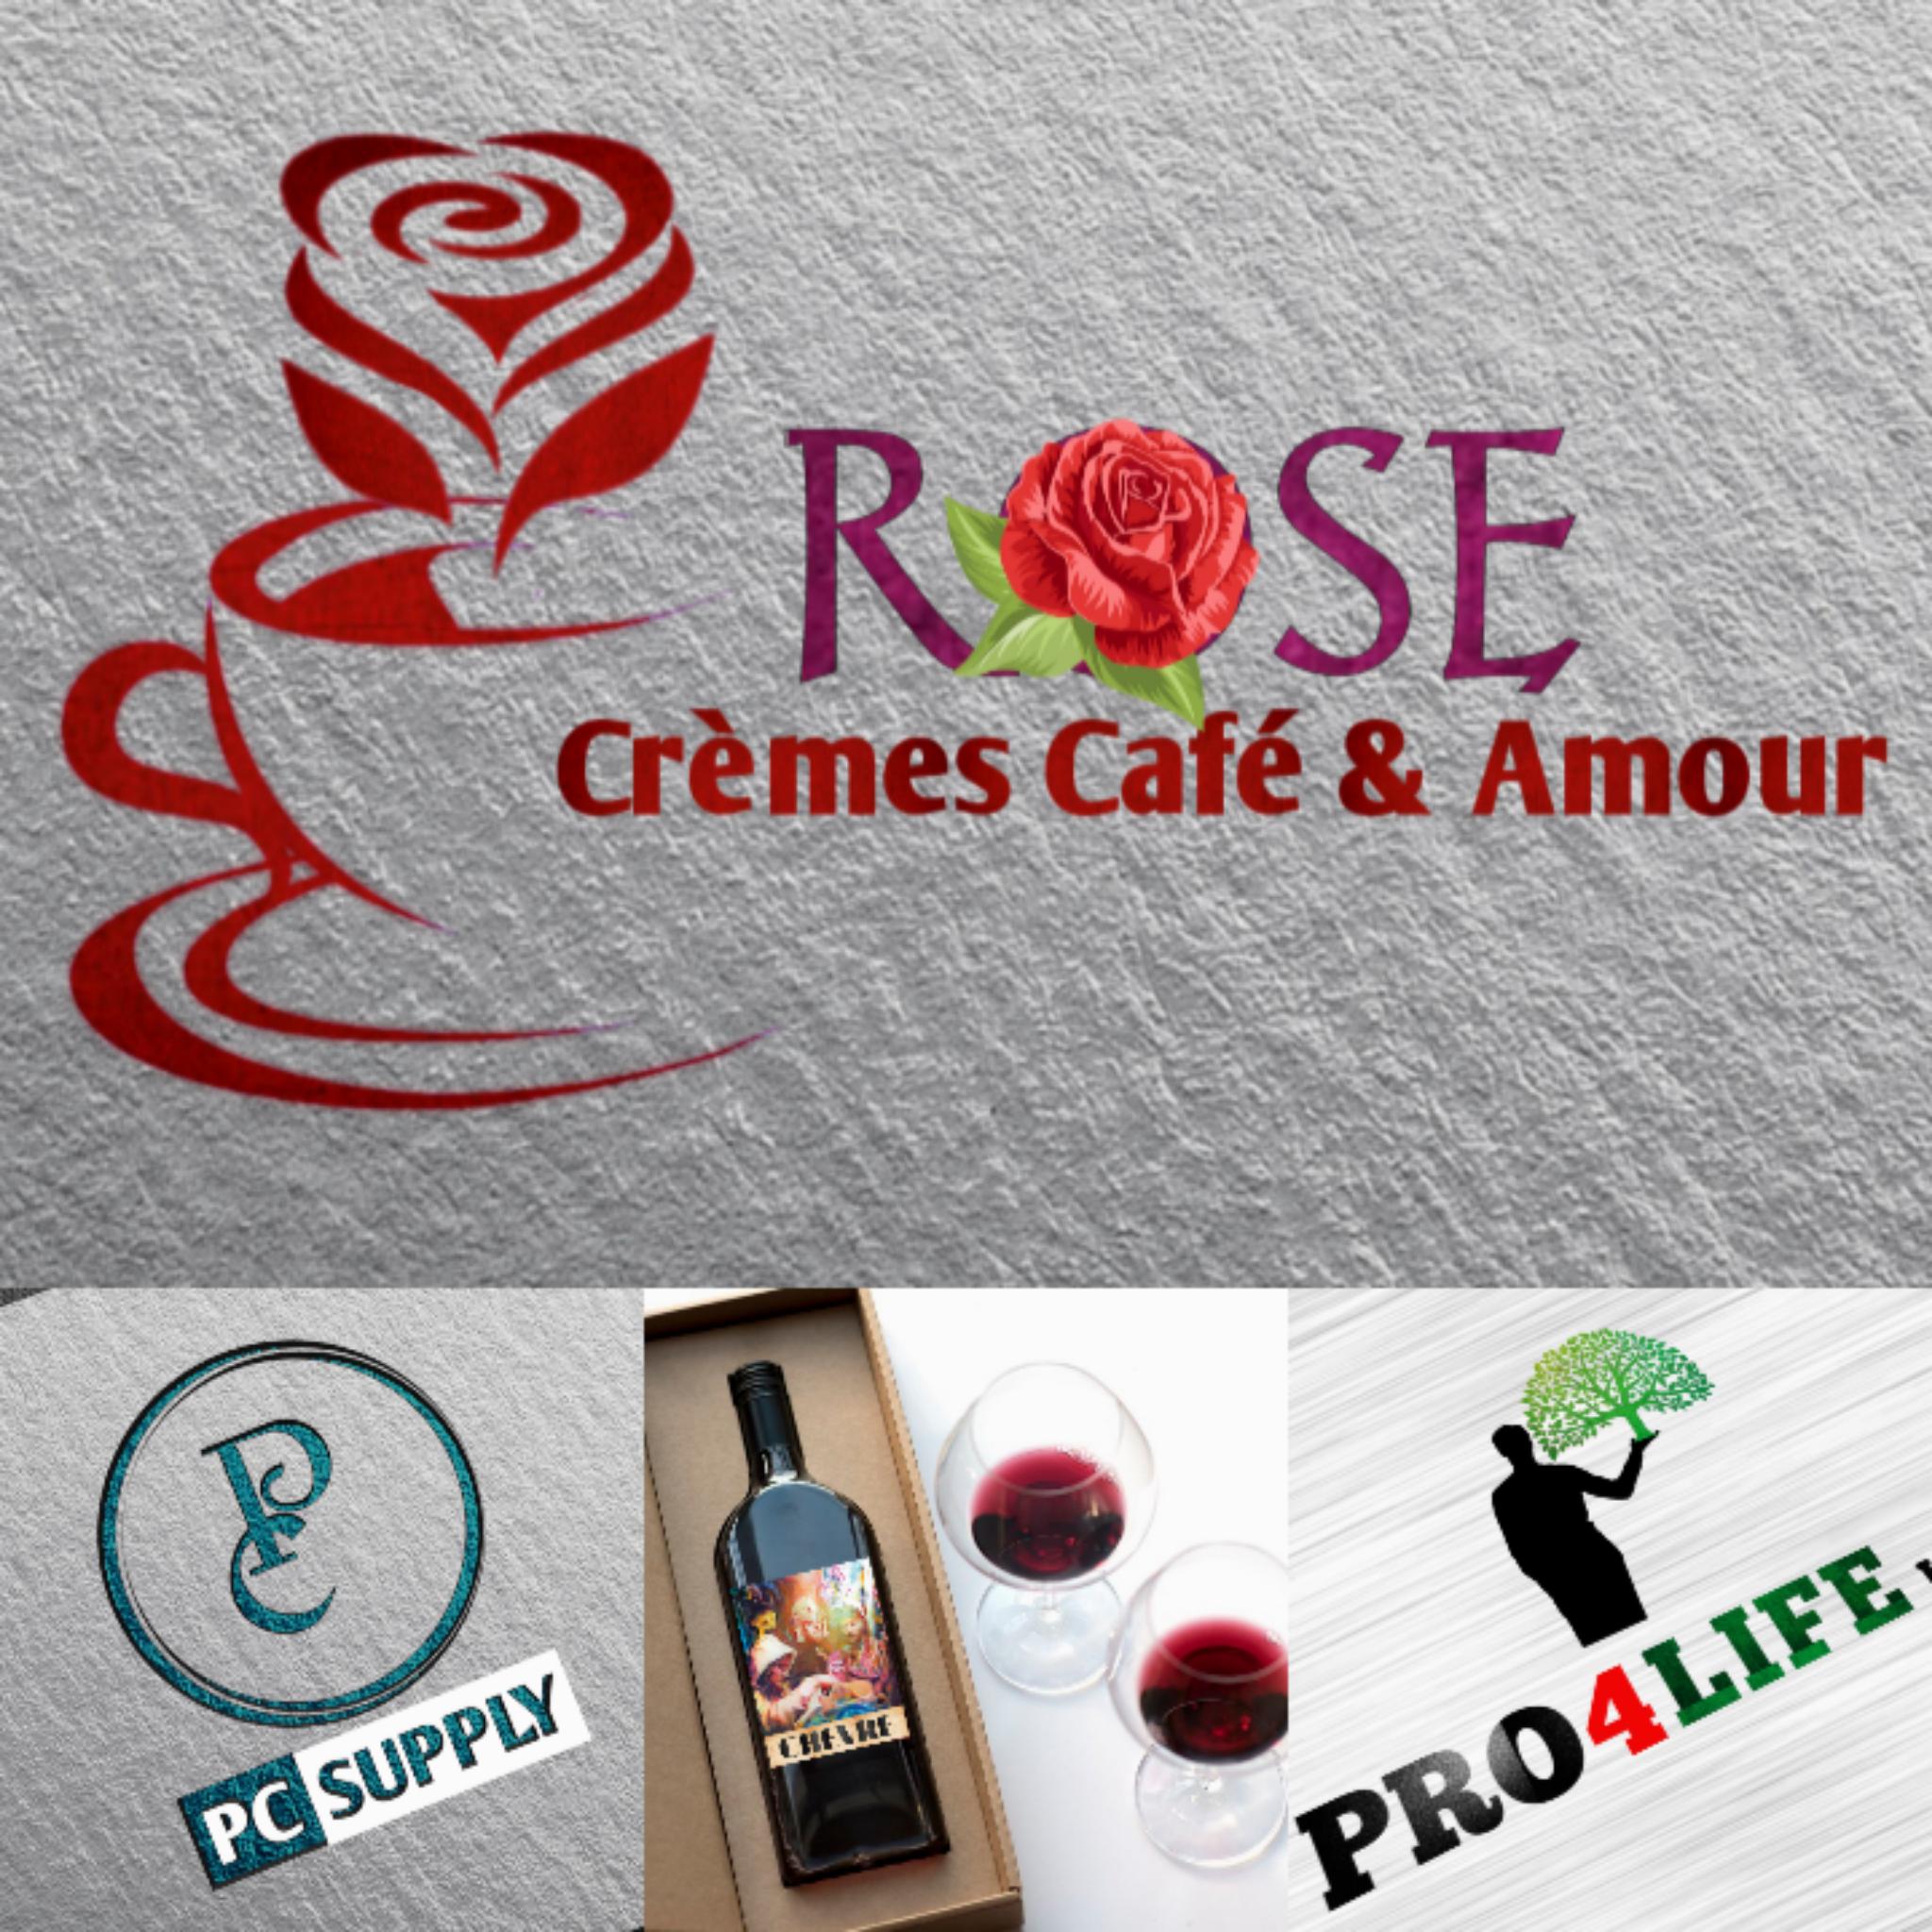 Logos and Creative graphic design